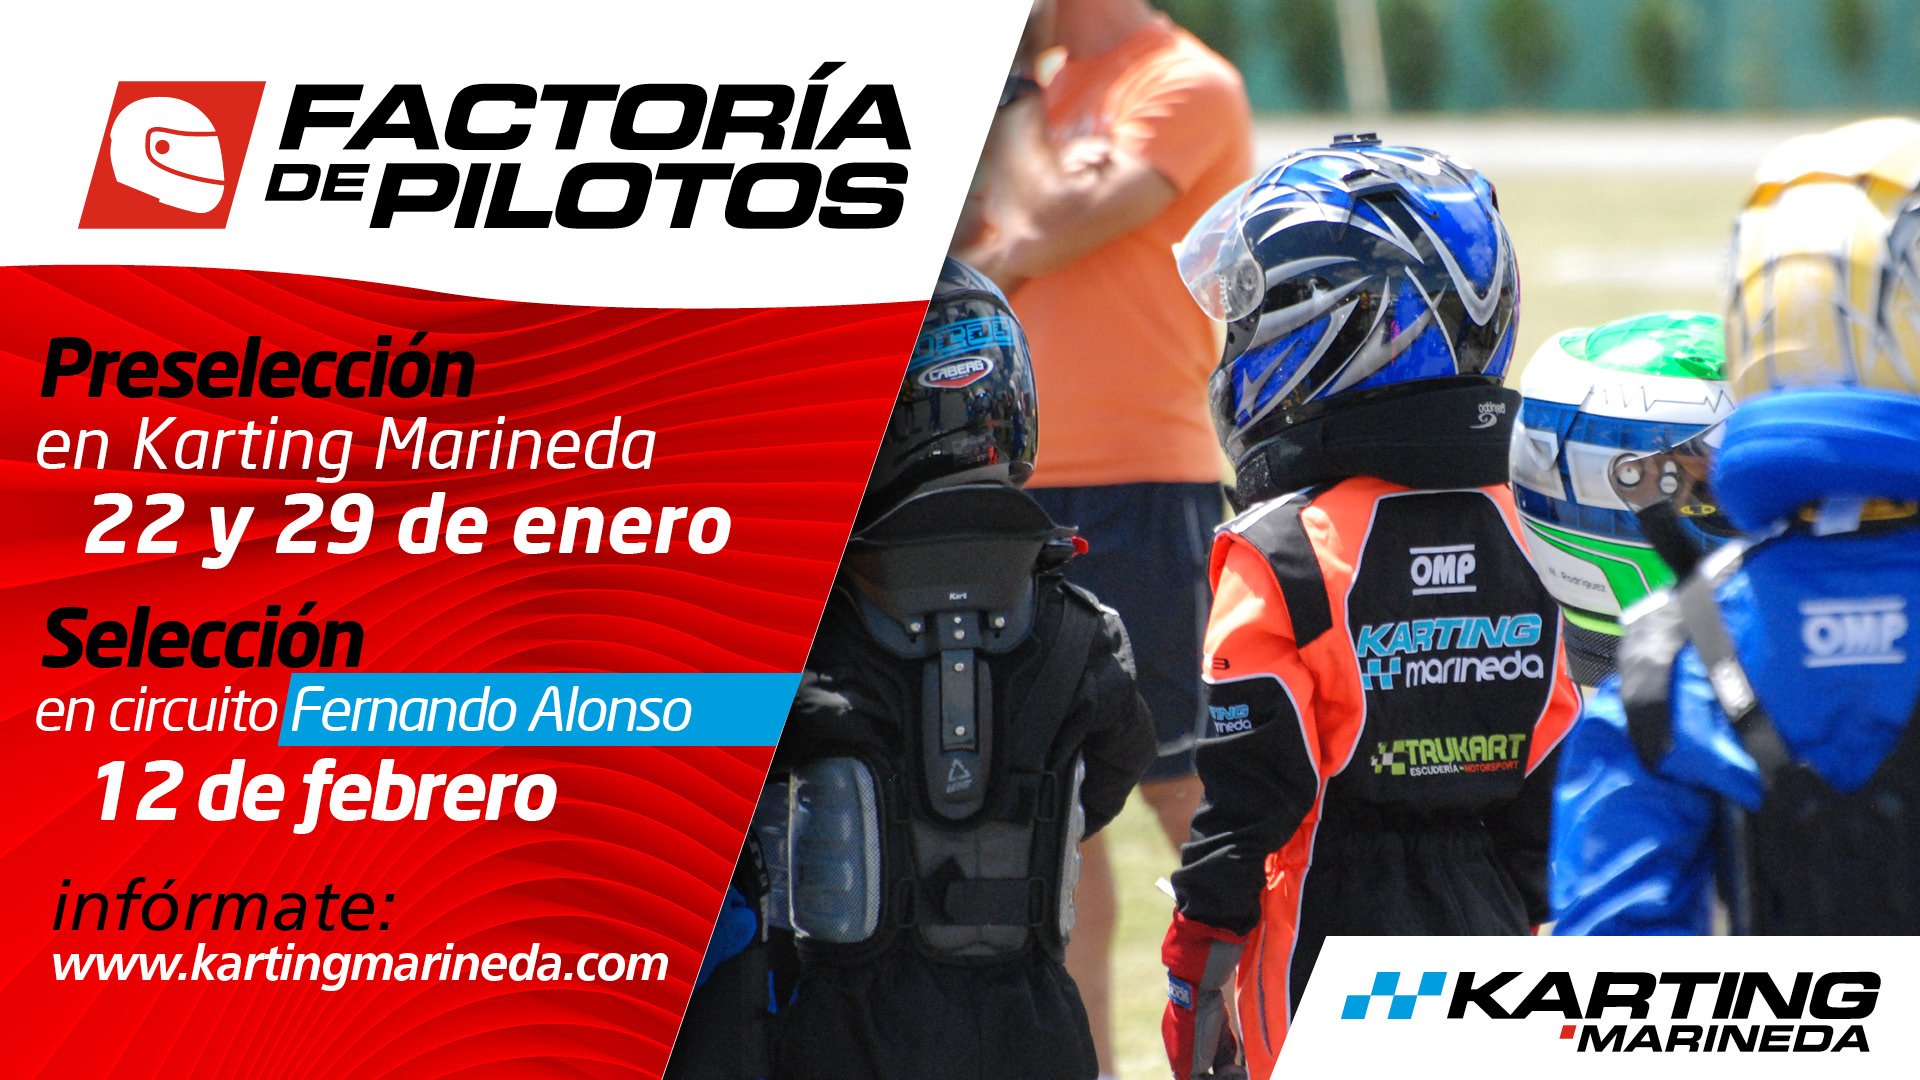 Full Hd Factoria De Pilotos 2